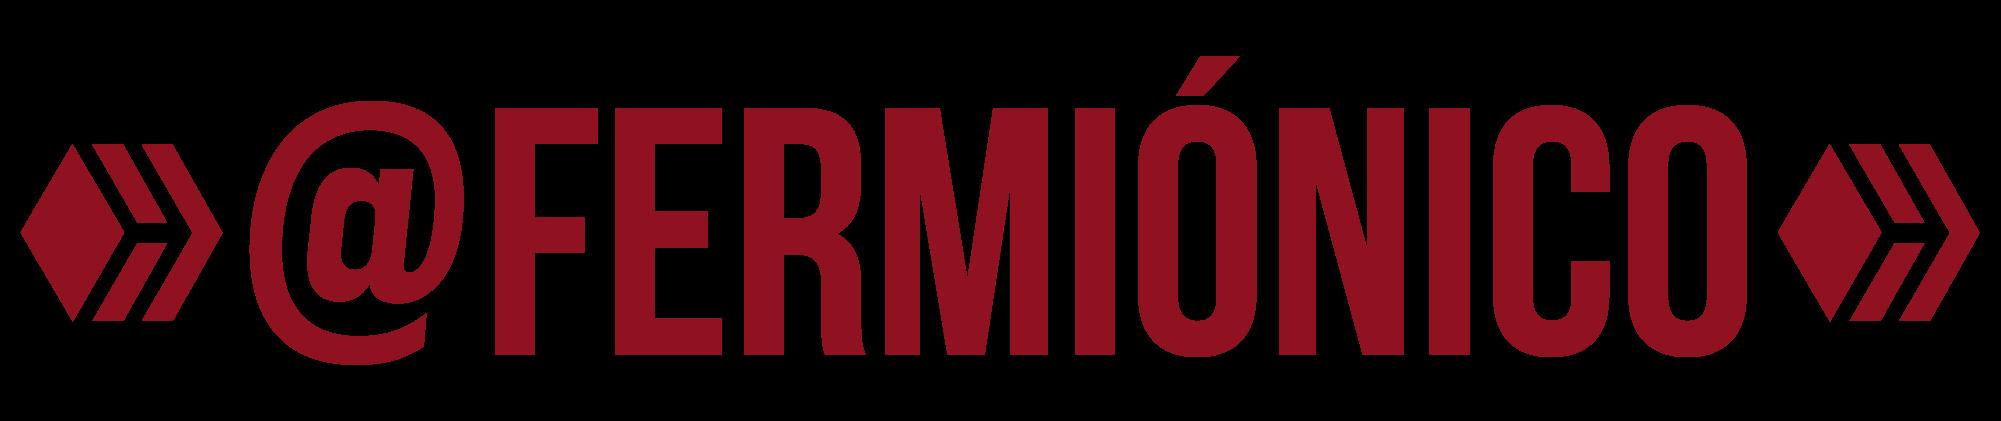 Firma Fermionico_Mesa de trabajo 16-10.png